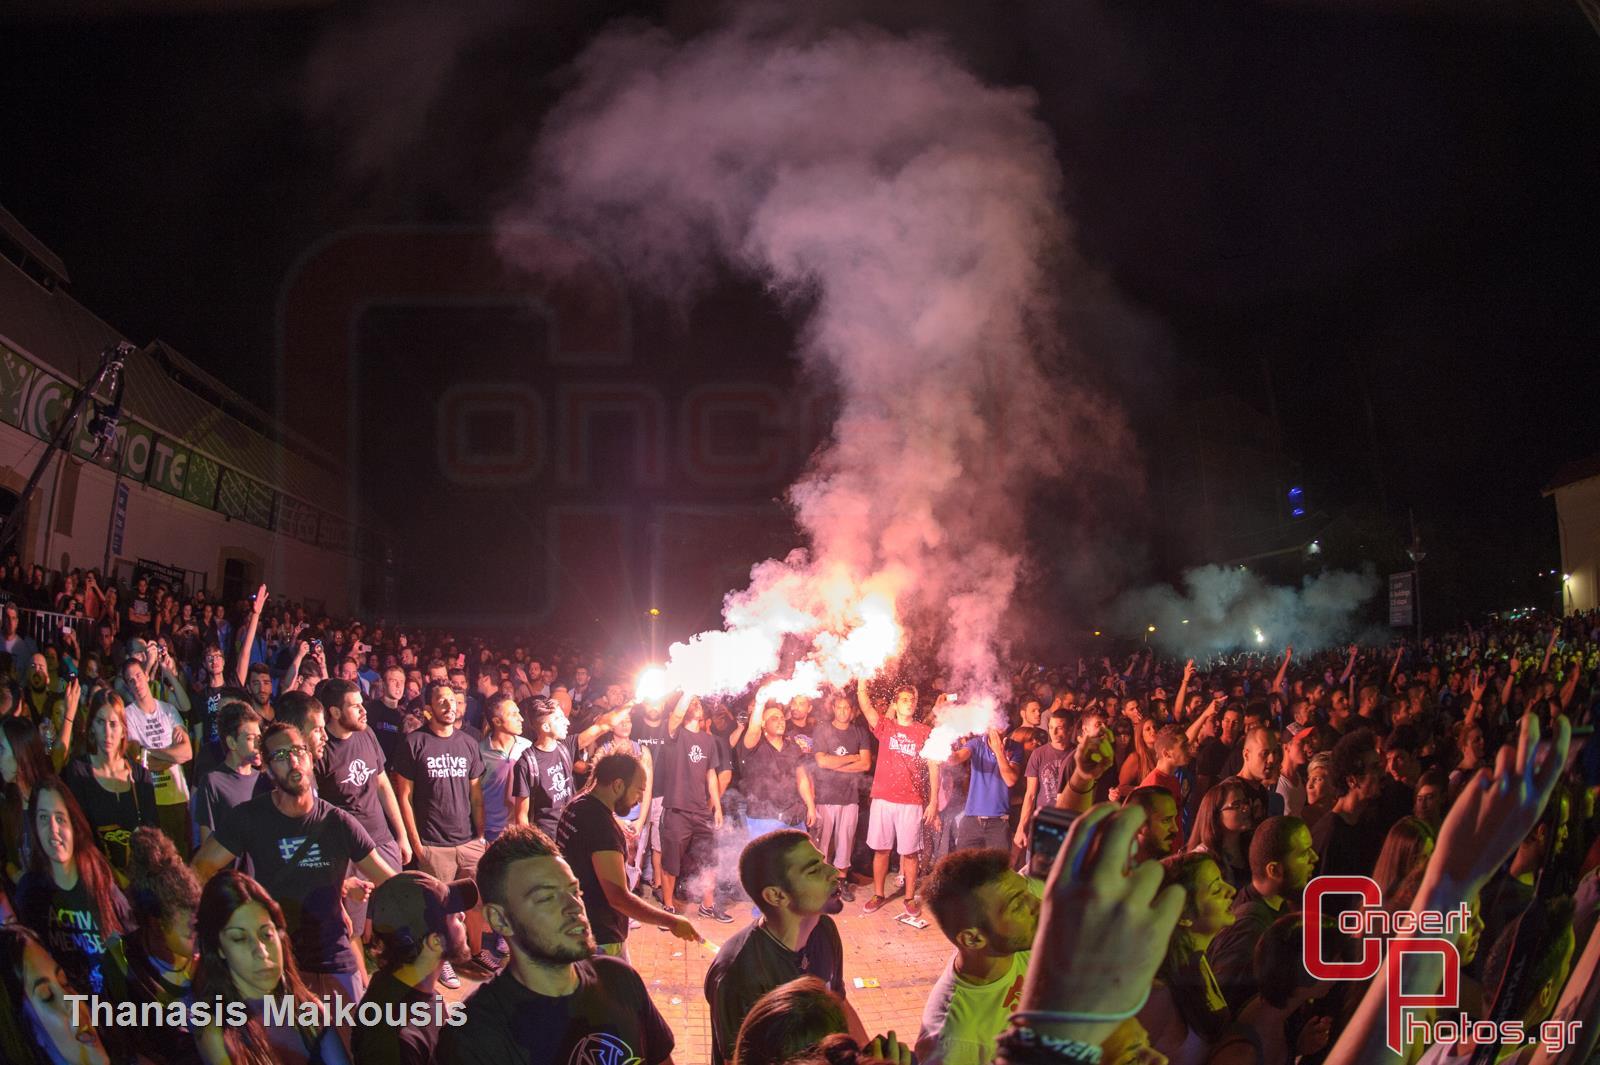 Active Member - Τραγούδα μας να φύγει το σκοτάδι- photographer: Thanasis Maikousis - concertphotos_-5246